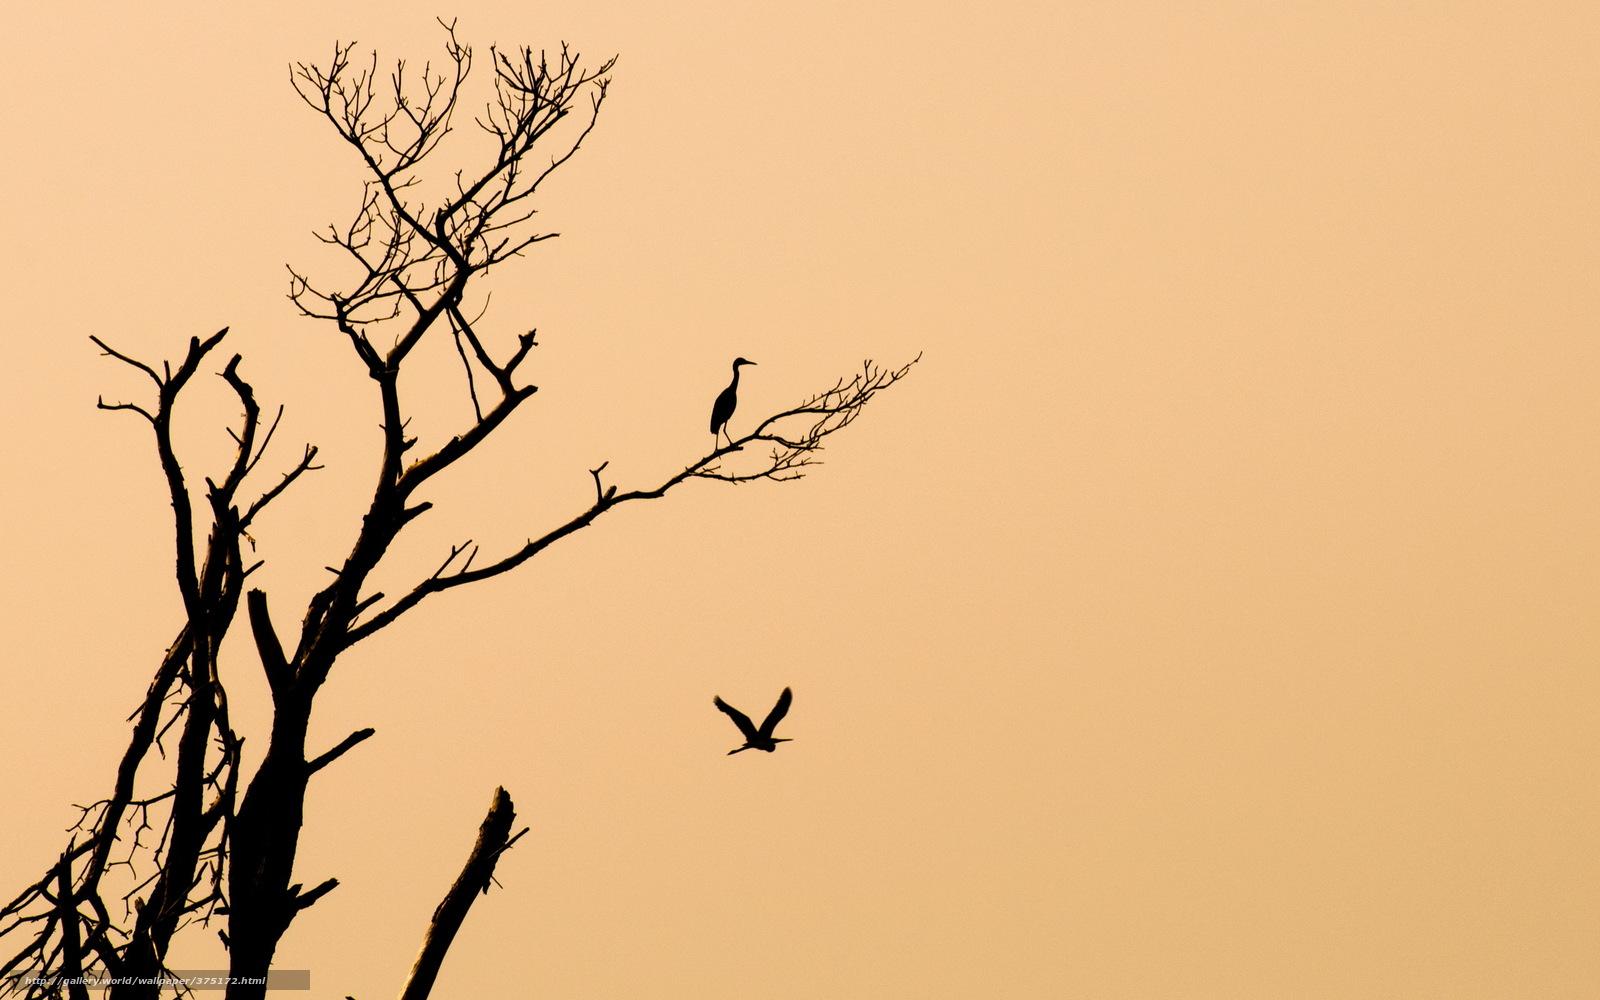 Download Wallpaper Birds Tree Minimalism Background